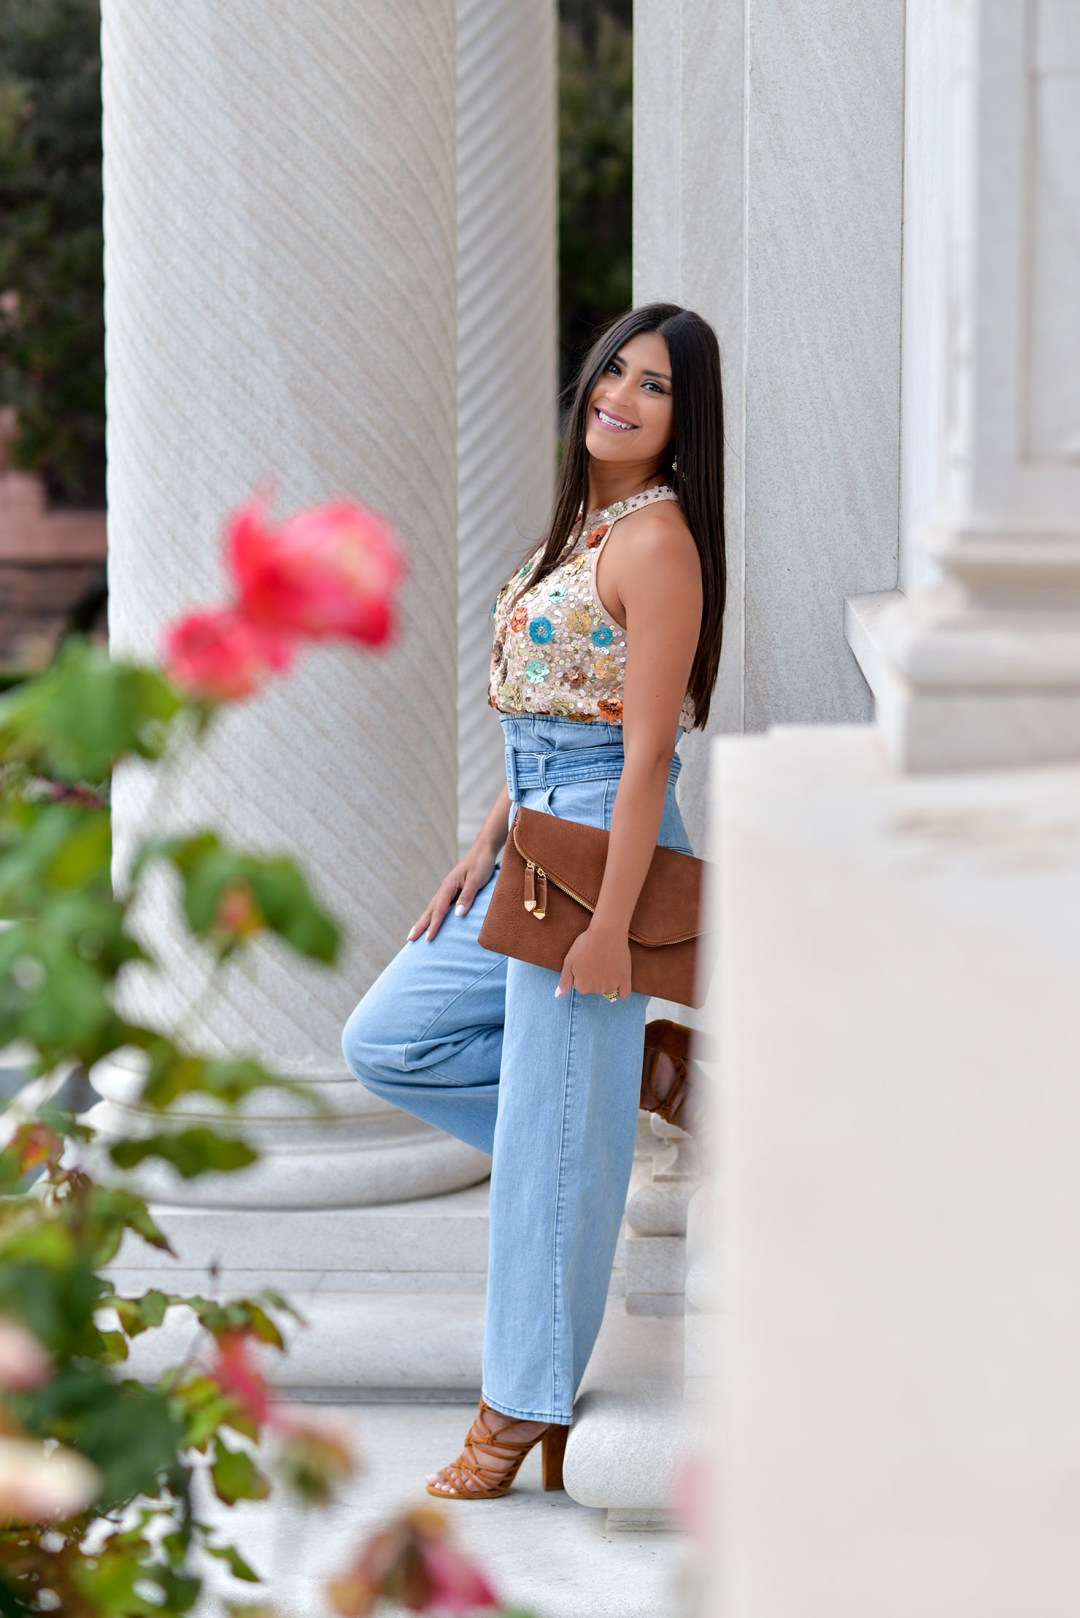 Lifestyle blogger Kelsey Kaplan of Kelsey Kaplan Fashion wearing paperbag jeans and River Island sequin top